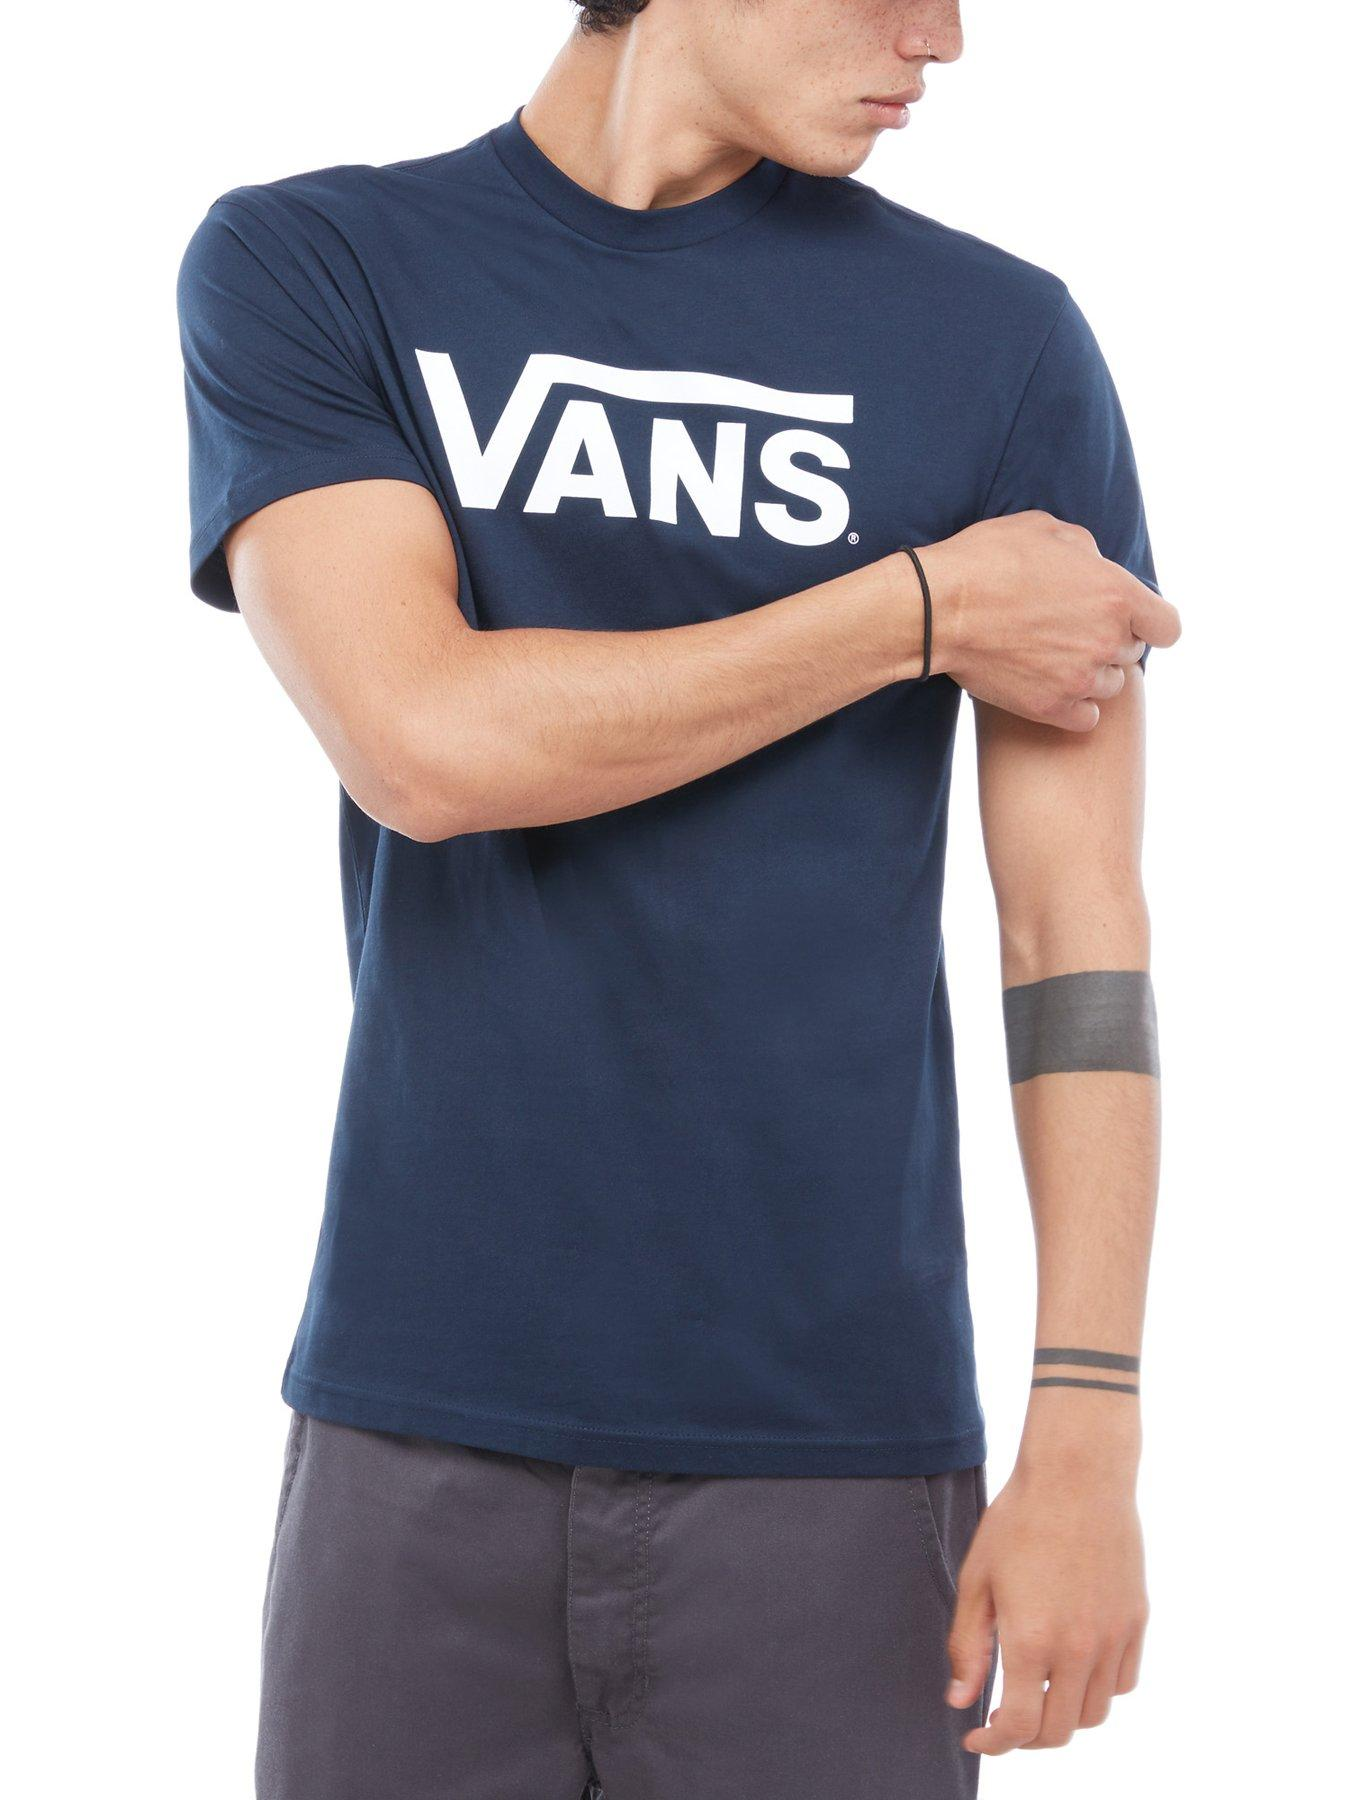 tshirt vans xxl